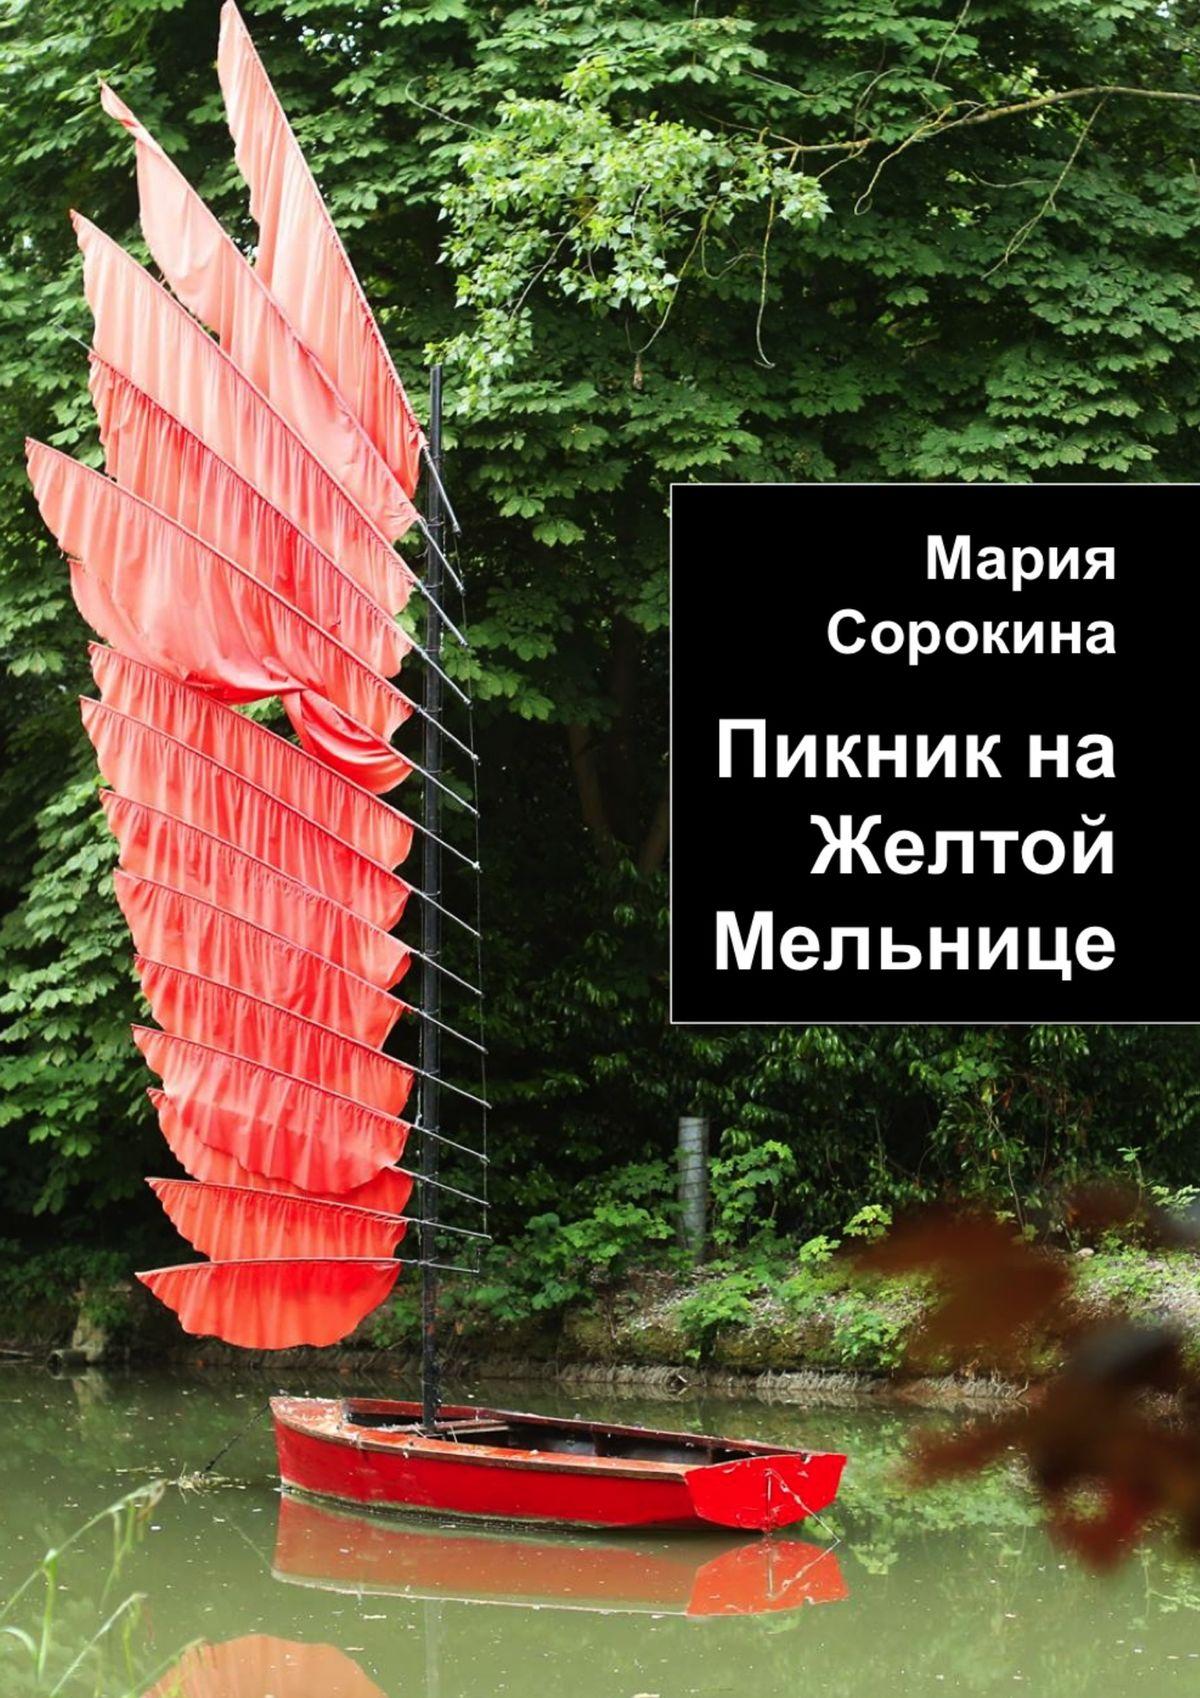 Мария Сорокина Пикник на Желтой Мельнице цена 2017